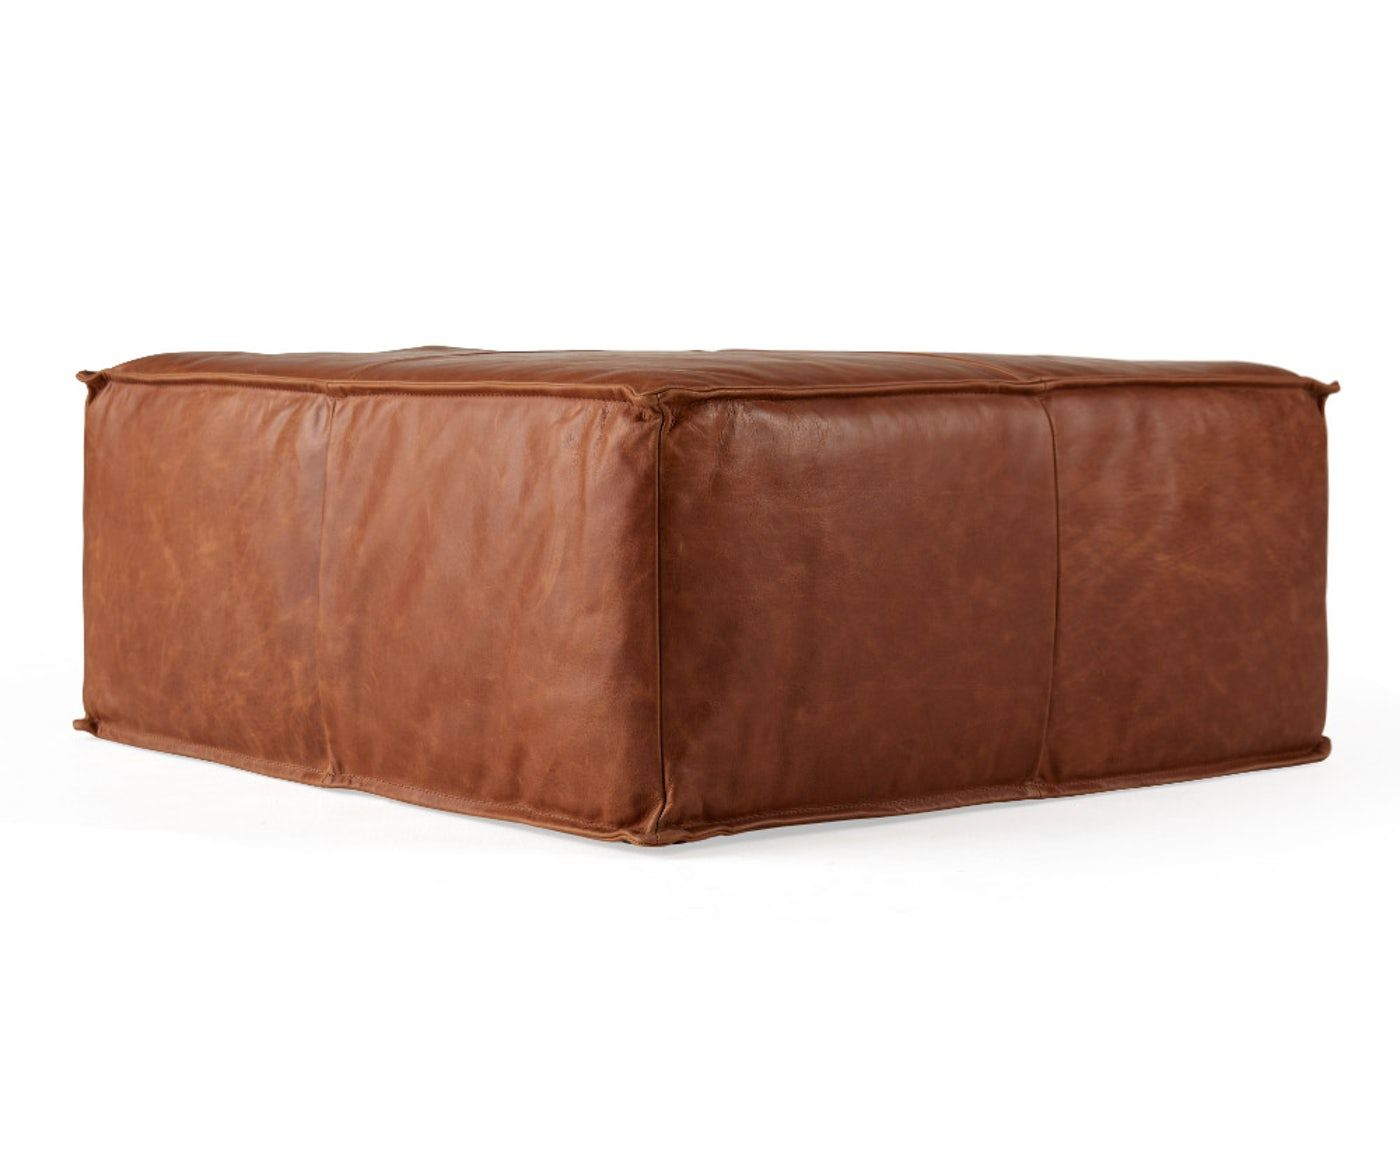 Magnificent Lyle Leather Ottoman In 2019 New Sd Home Leather Ottoman Creativecarmelina Interior Chair Design Creativecarmelinacom